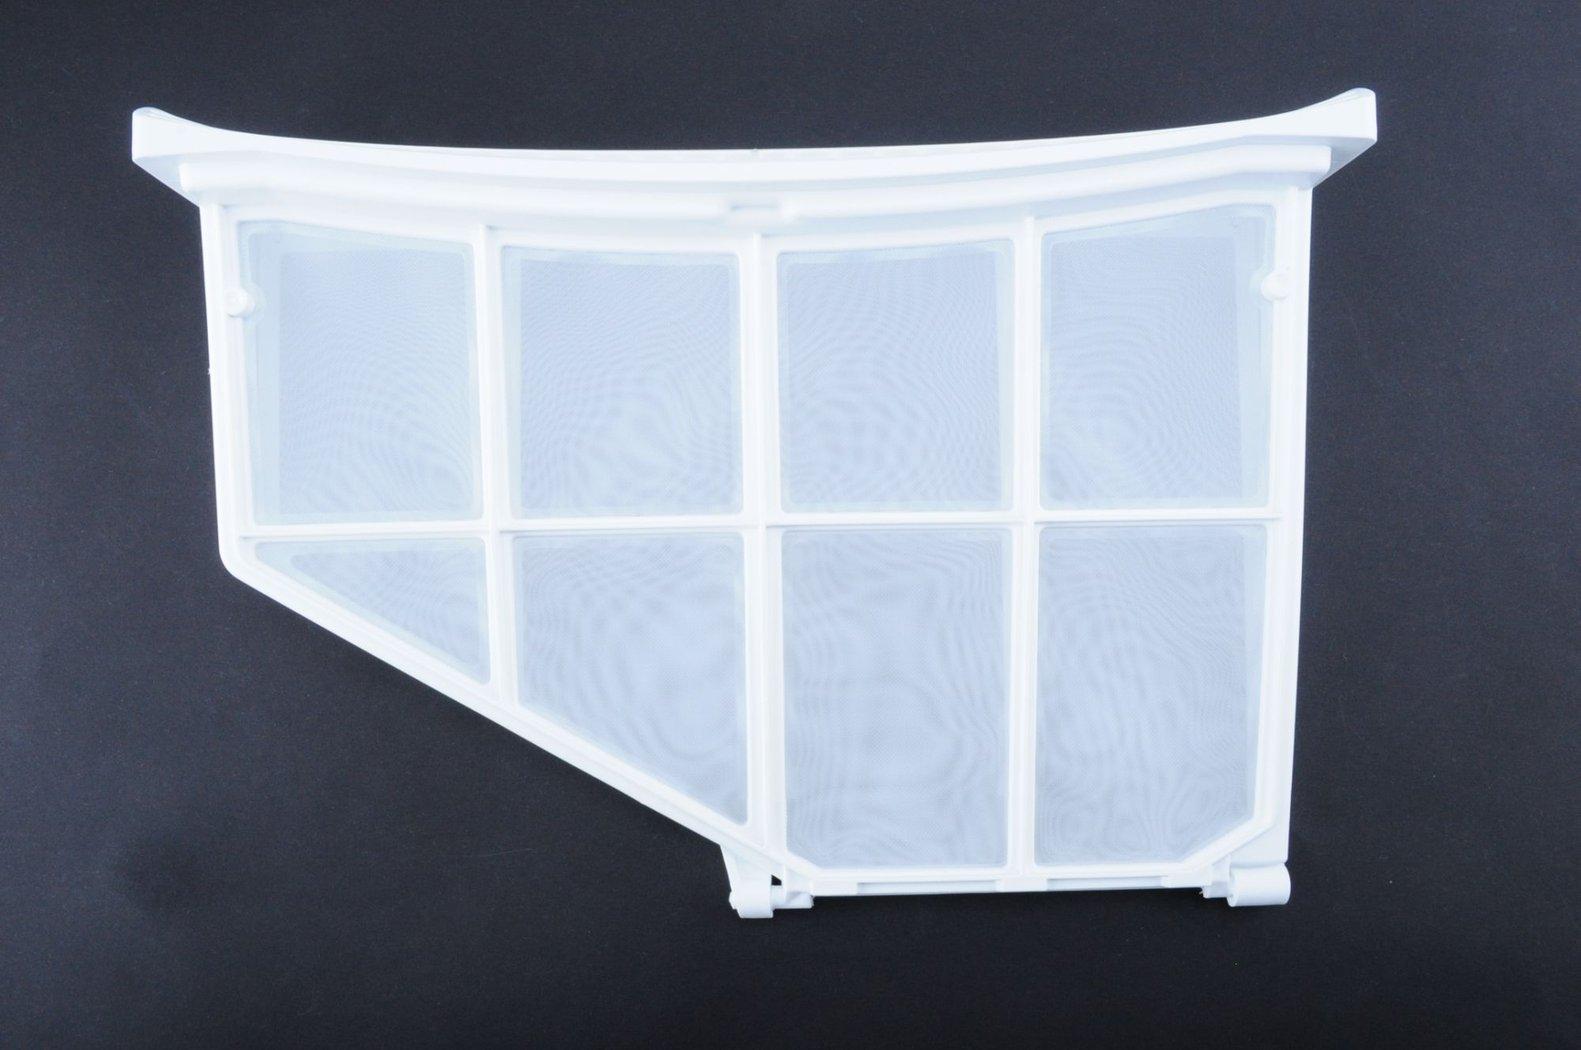 aeg w schetrockner flusensieb flusenfilter klapp sieb 1366339024. Black Bedroom Furniture Sets. Home Design Ideas